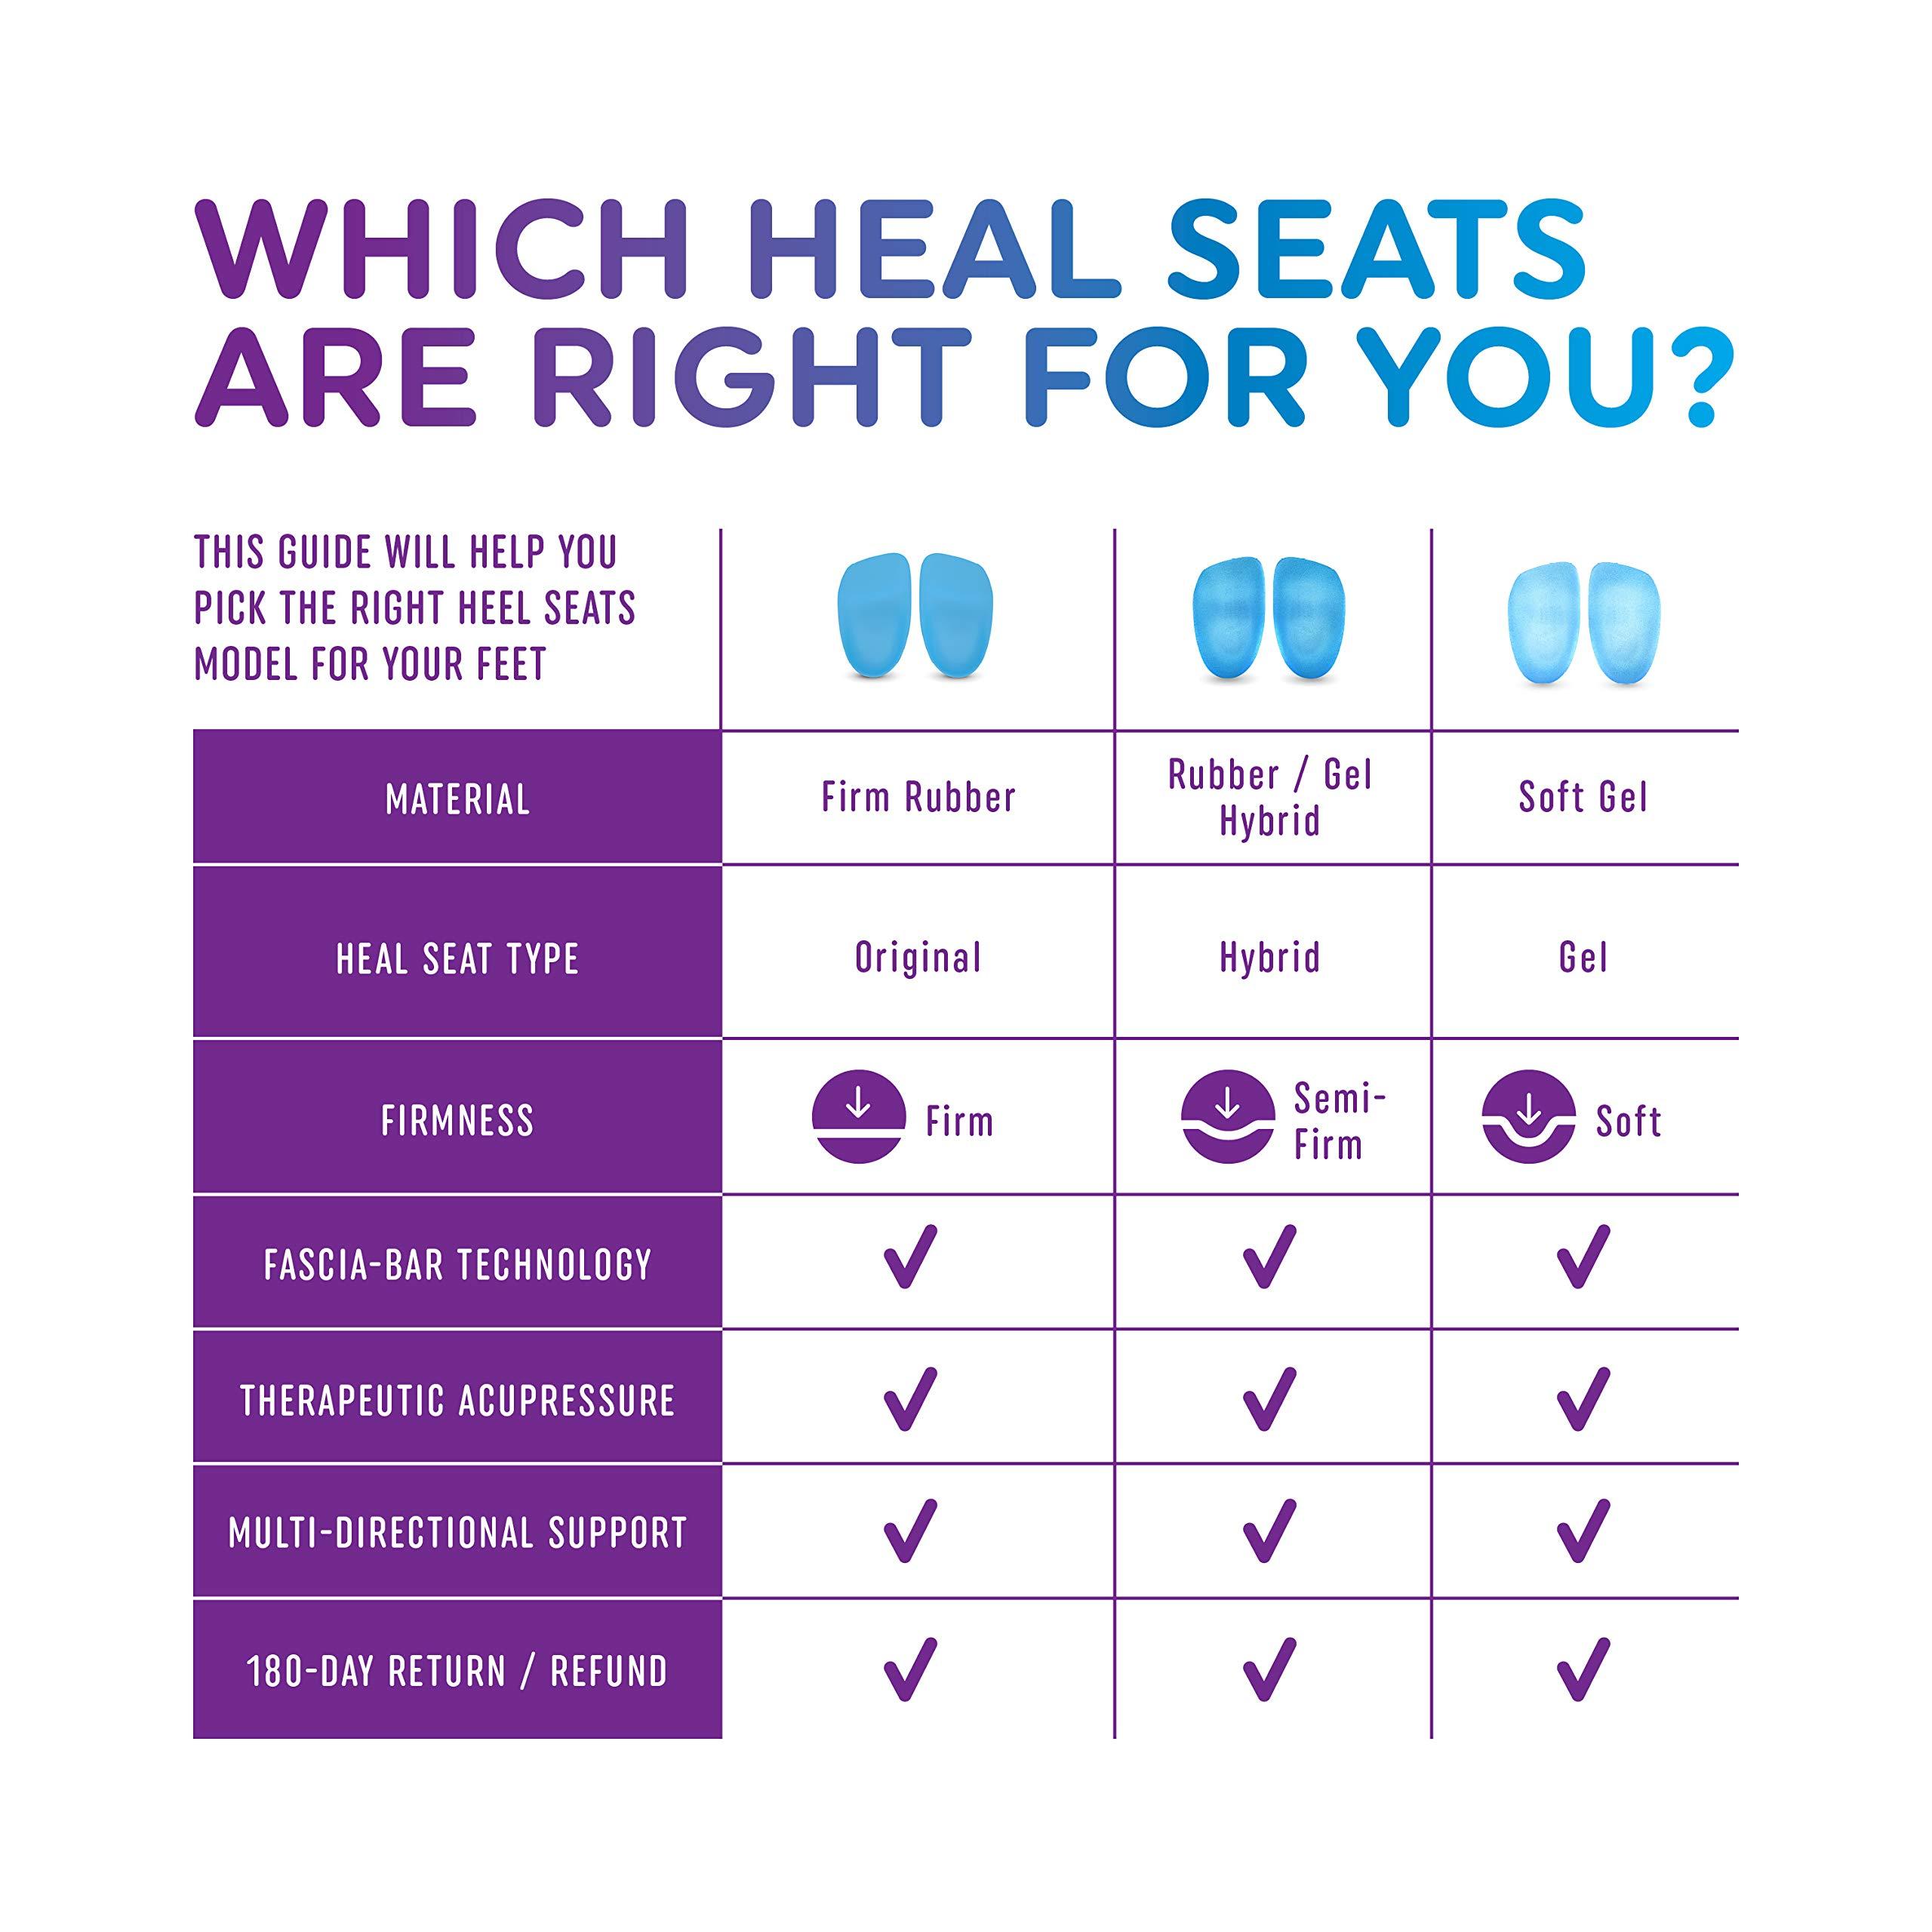 Heel That Pain GEL Heel Seats Foot Orthotic Inserts - Heel Cups Cushions Insoles for Plantar Fasciitis, Heel Spurs, and Heel Pain, Medium (Women's 6.5-10, Men's 5-8) by Heel That Pain (Image #4)